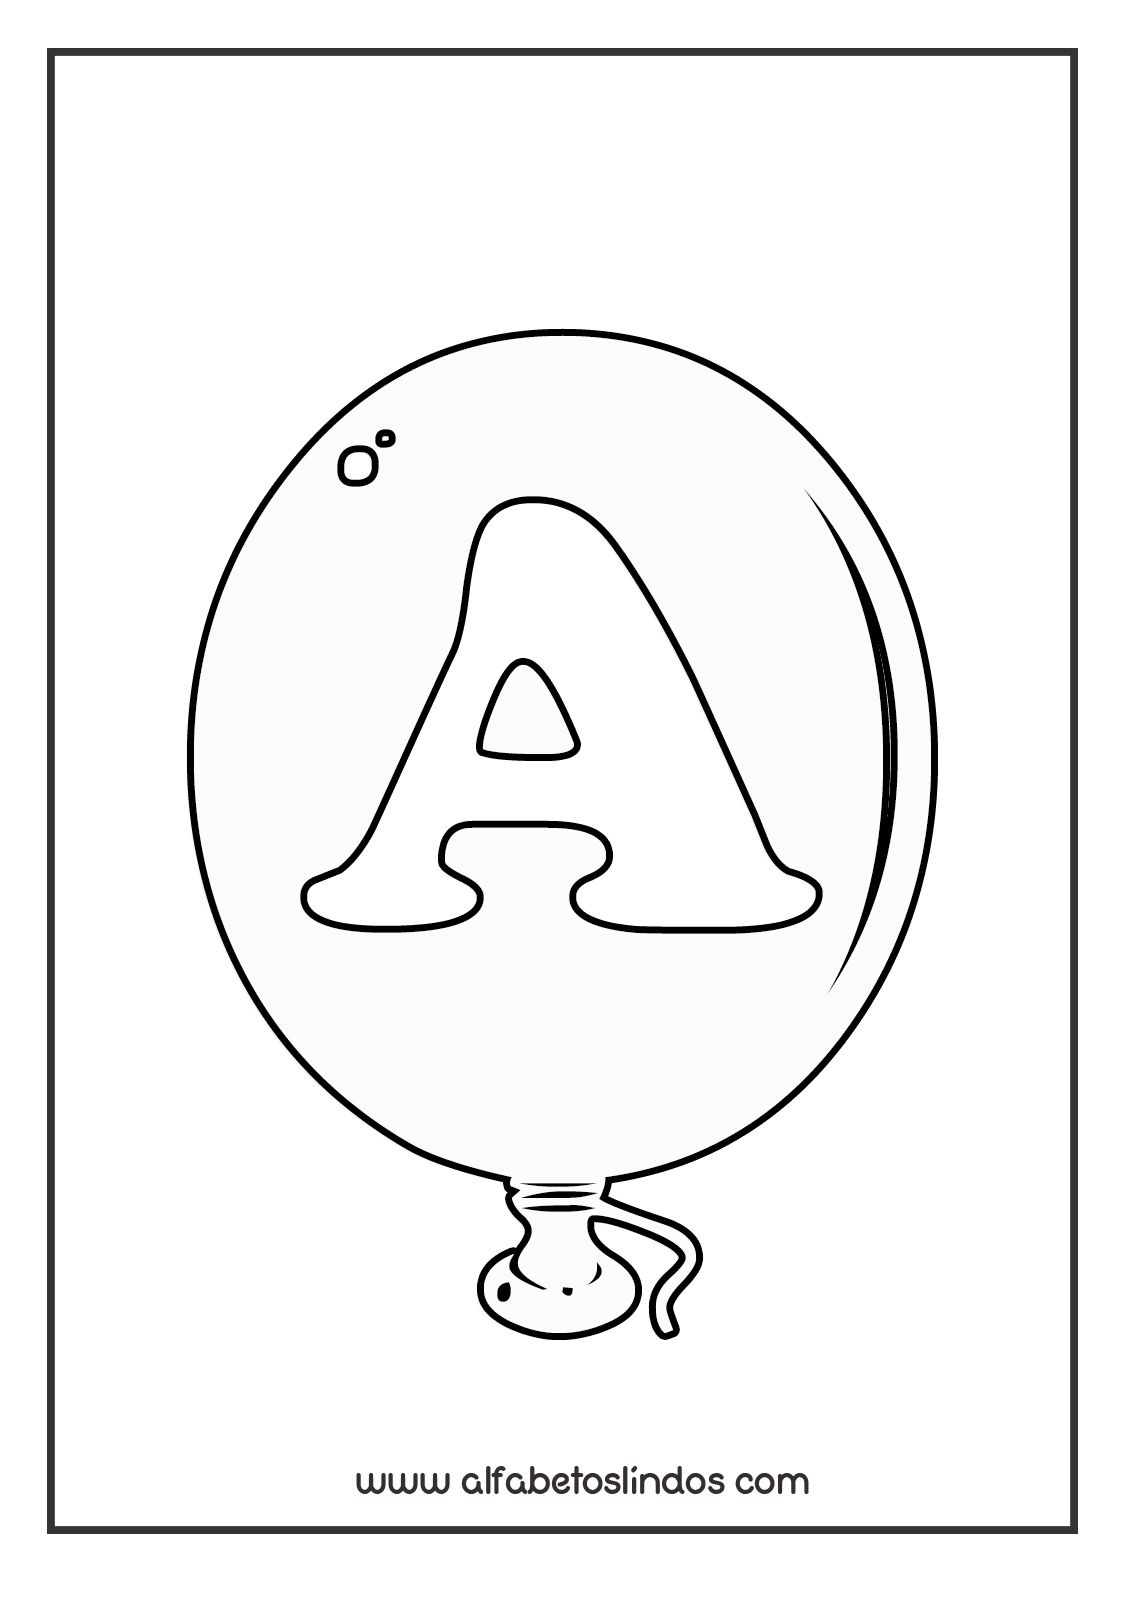 alfabeto letras letters abc abeced c3 a1rio bal c3 a3o bal c3 b5es